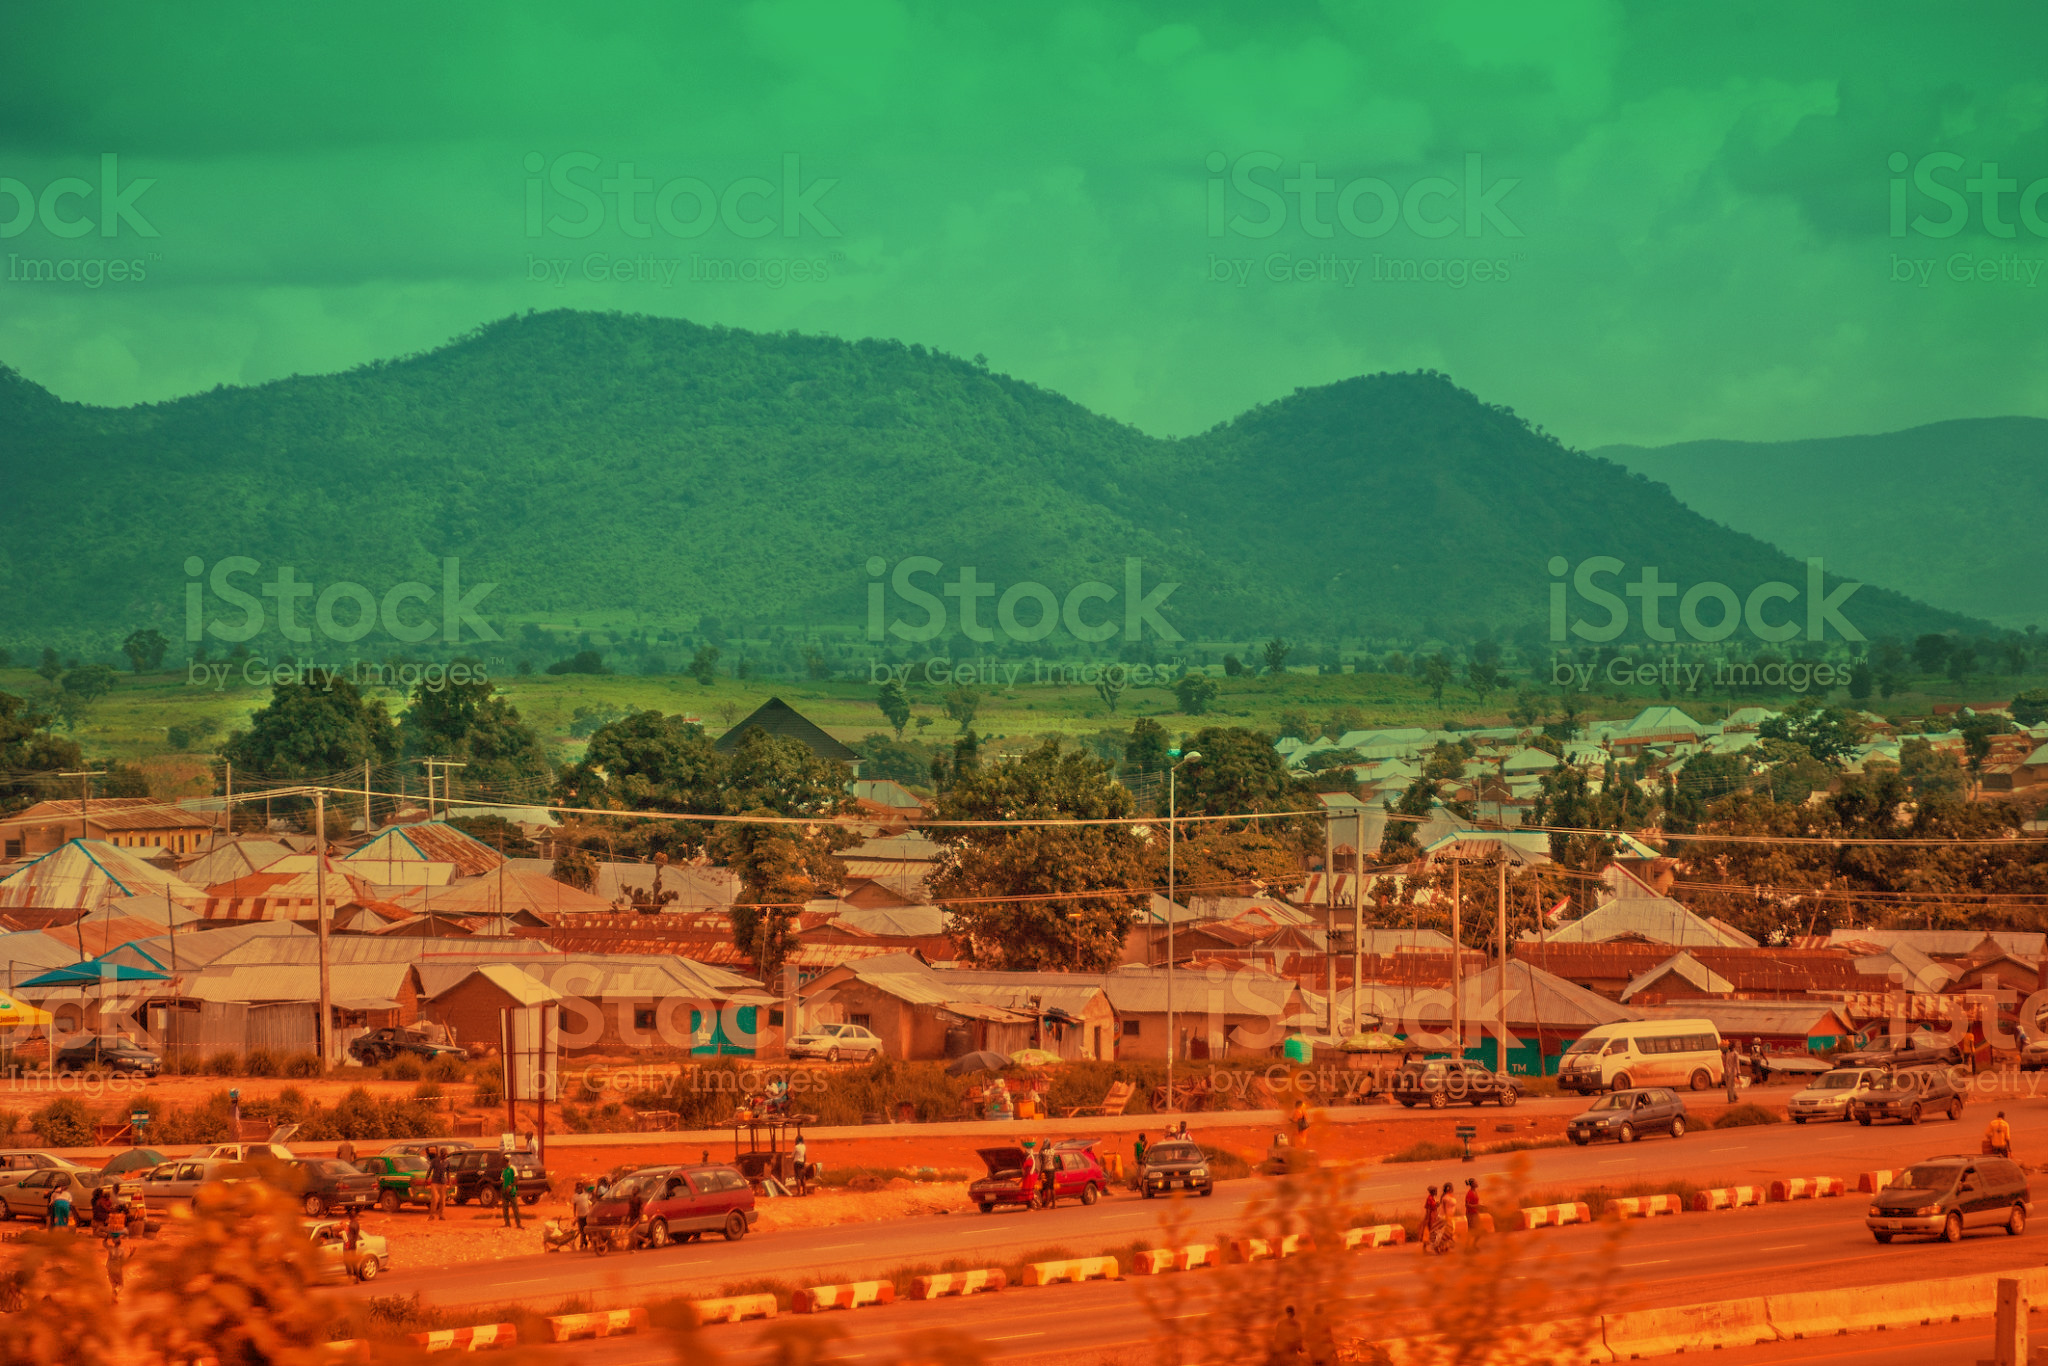 Nigeria visual 2.jpg